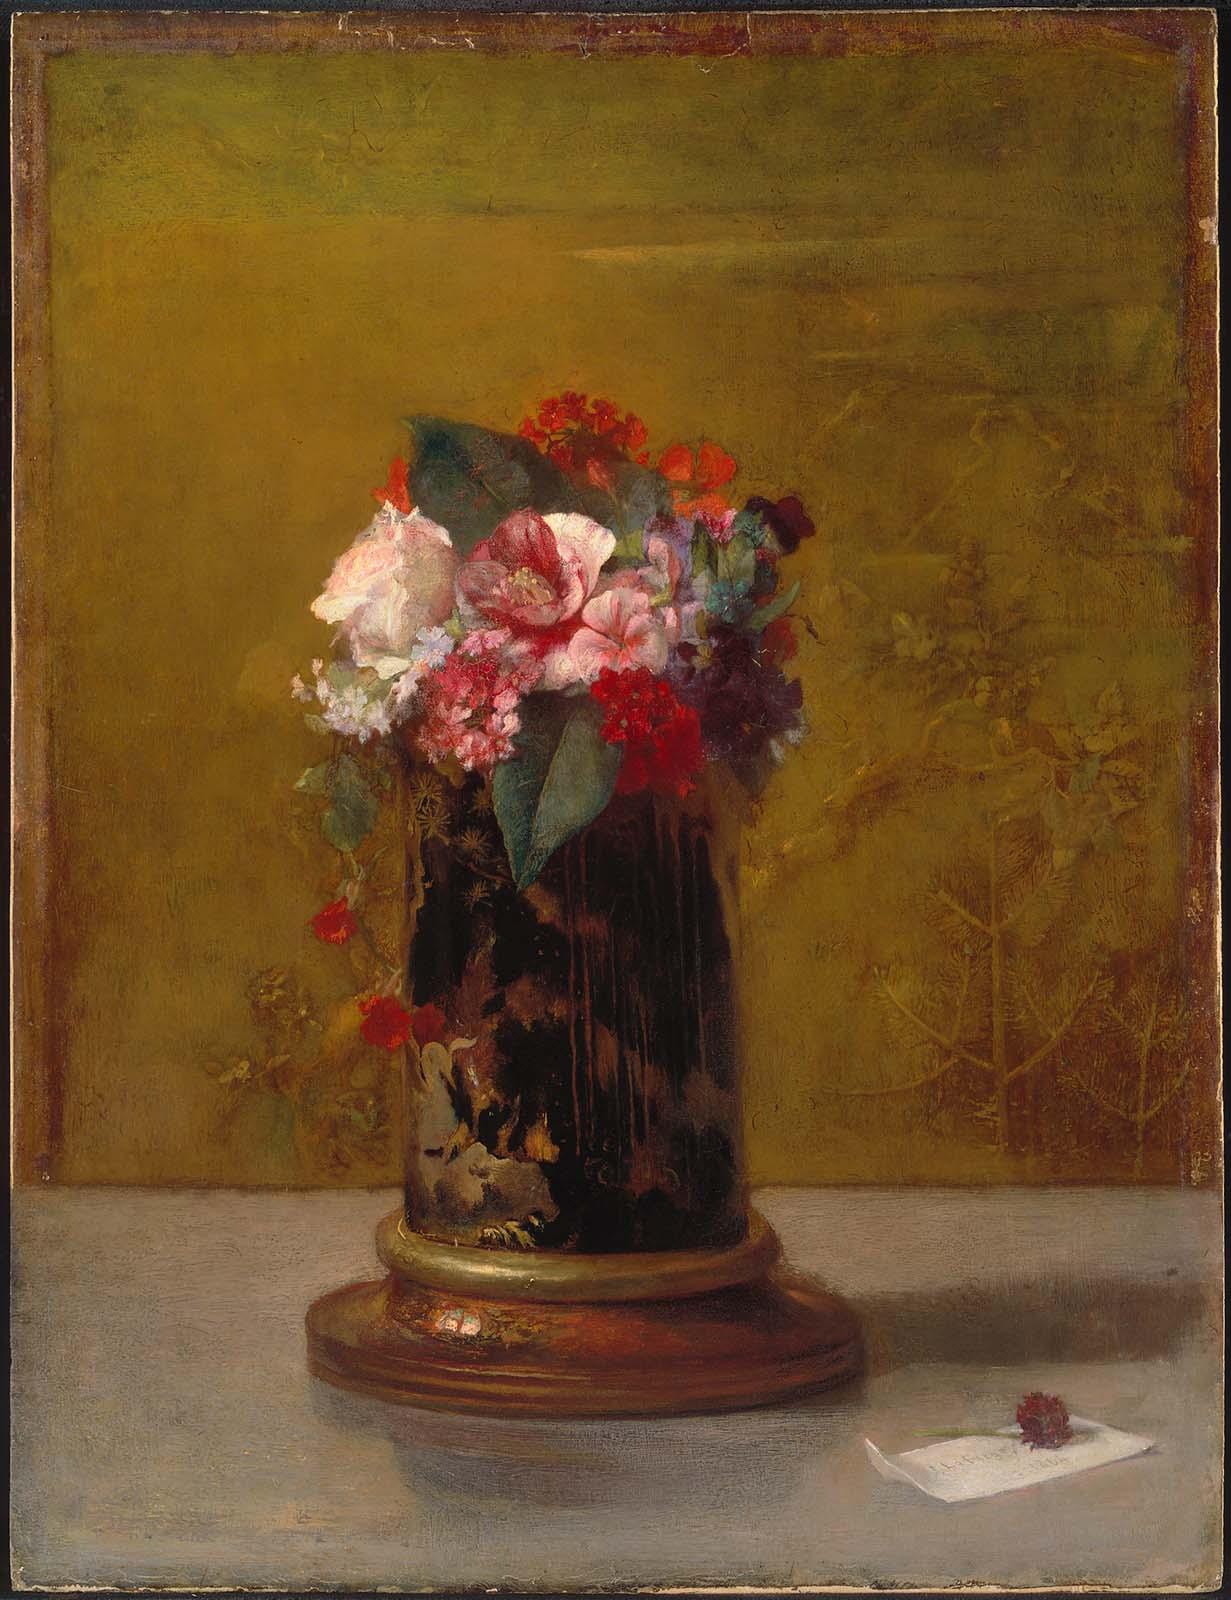 Mfa images bouquets museum of fine arts boston vase of flowers izmirmasajfo